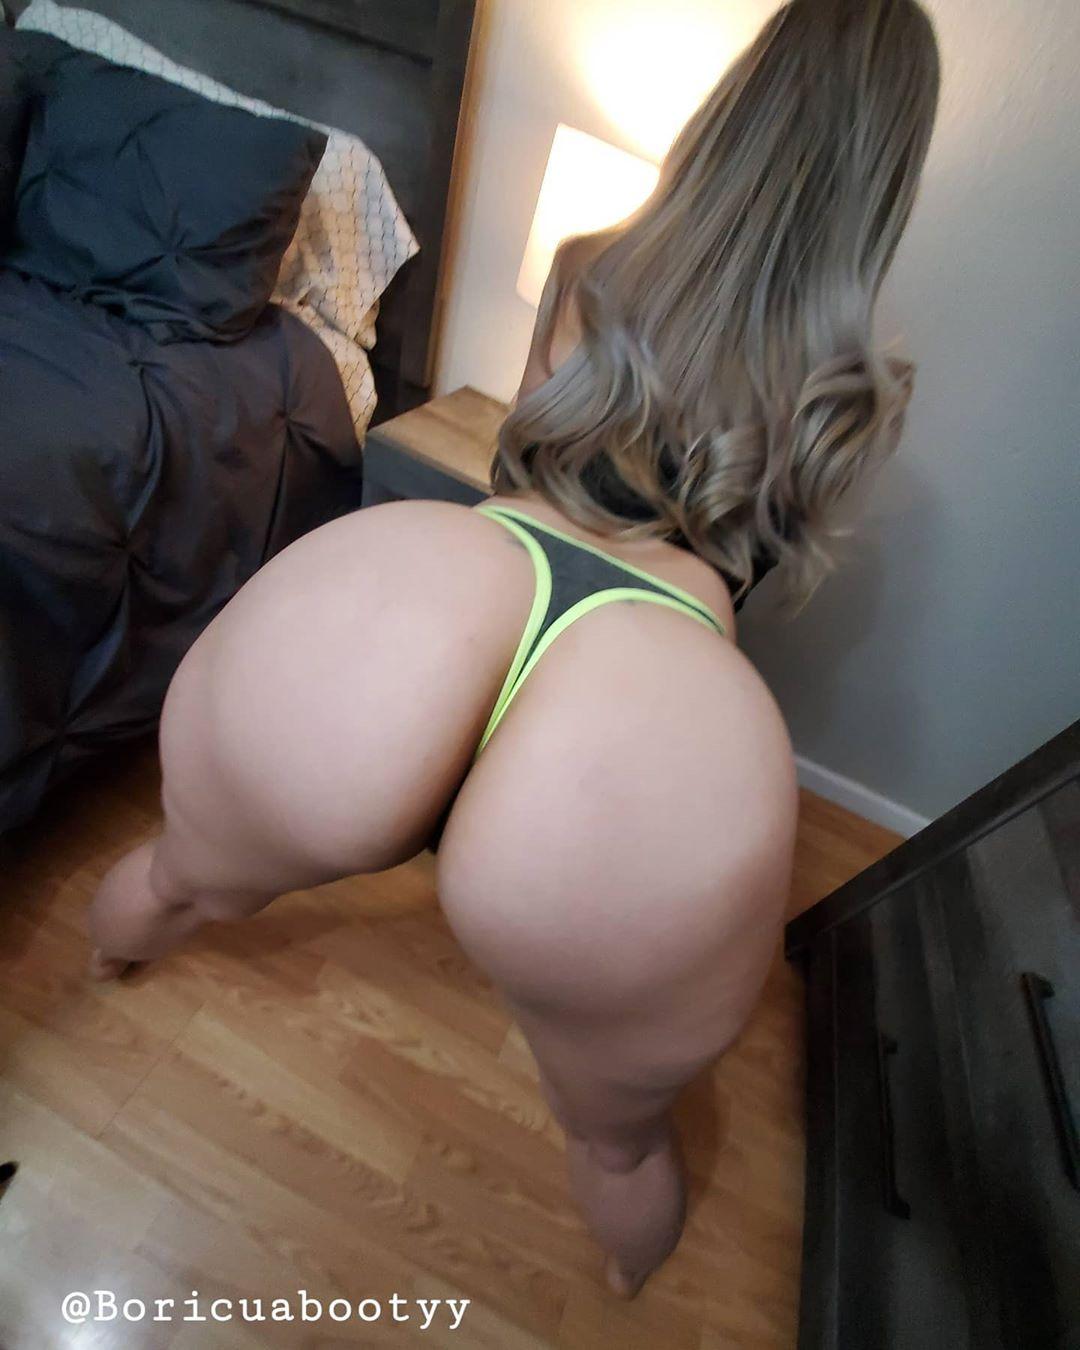 Boricuabootyy Nude & Sex Tape Onlyfans Leaked! 0029